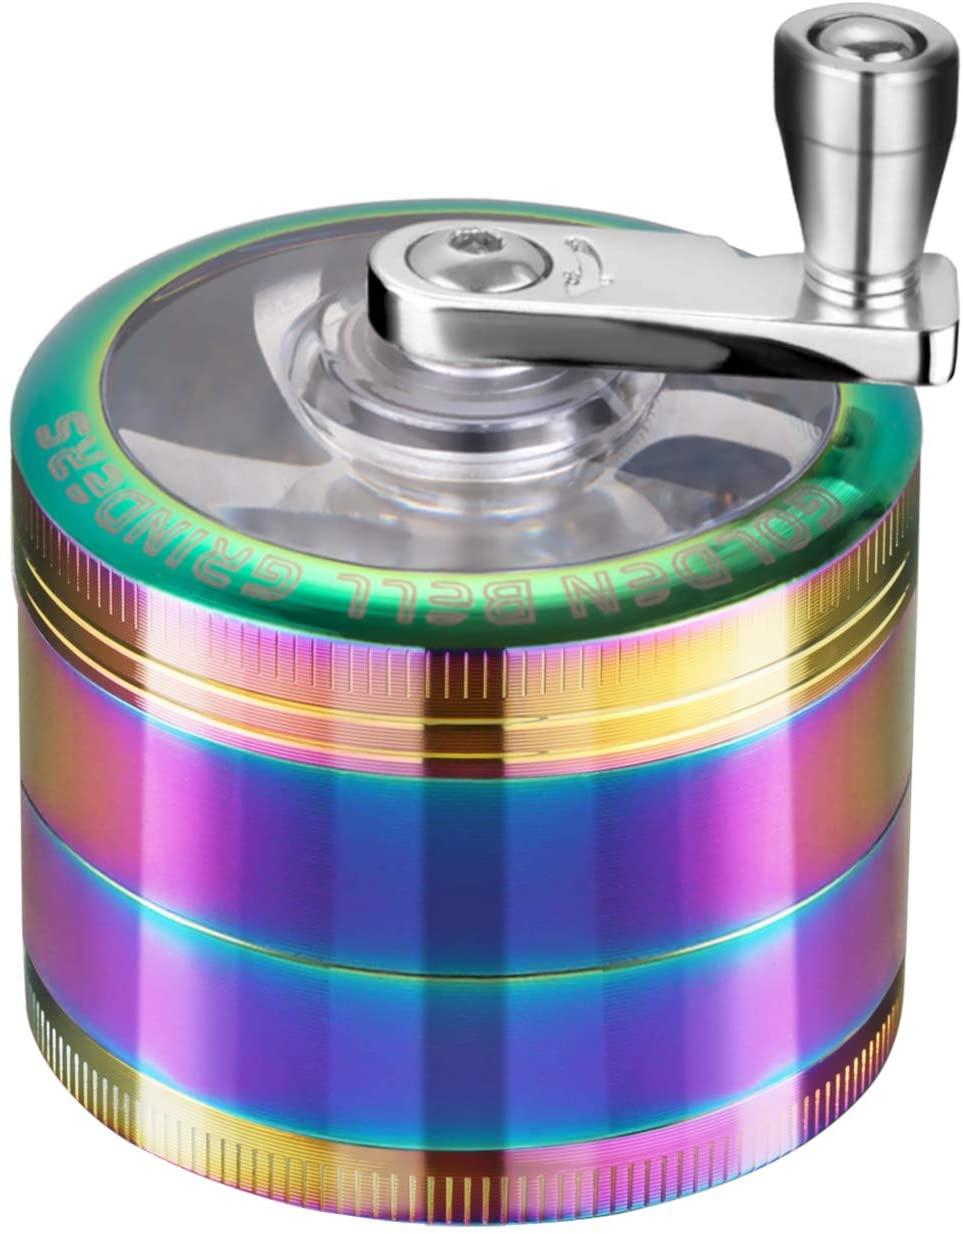 Golden Bell Hand Cranked Spice Herb Grinder, 2 Inch (Rainbow Color)